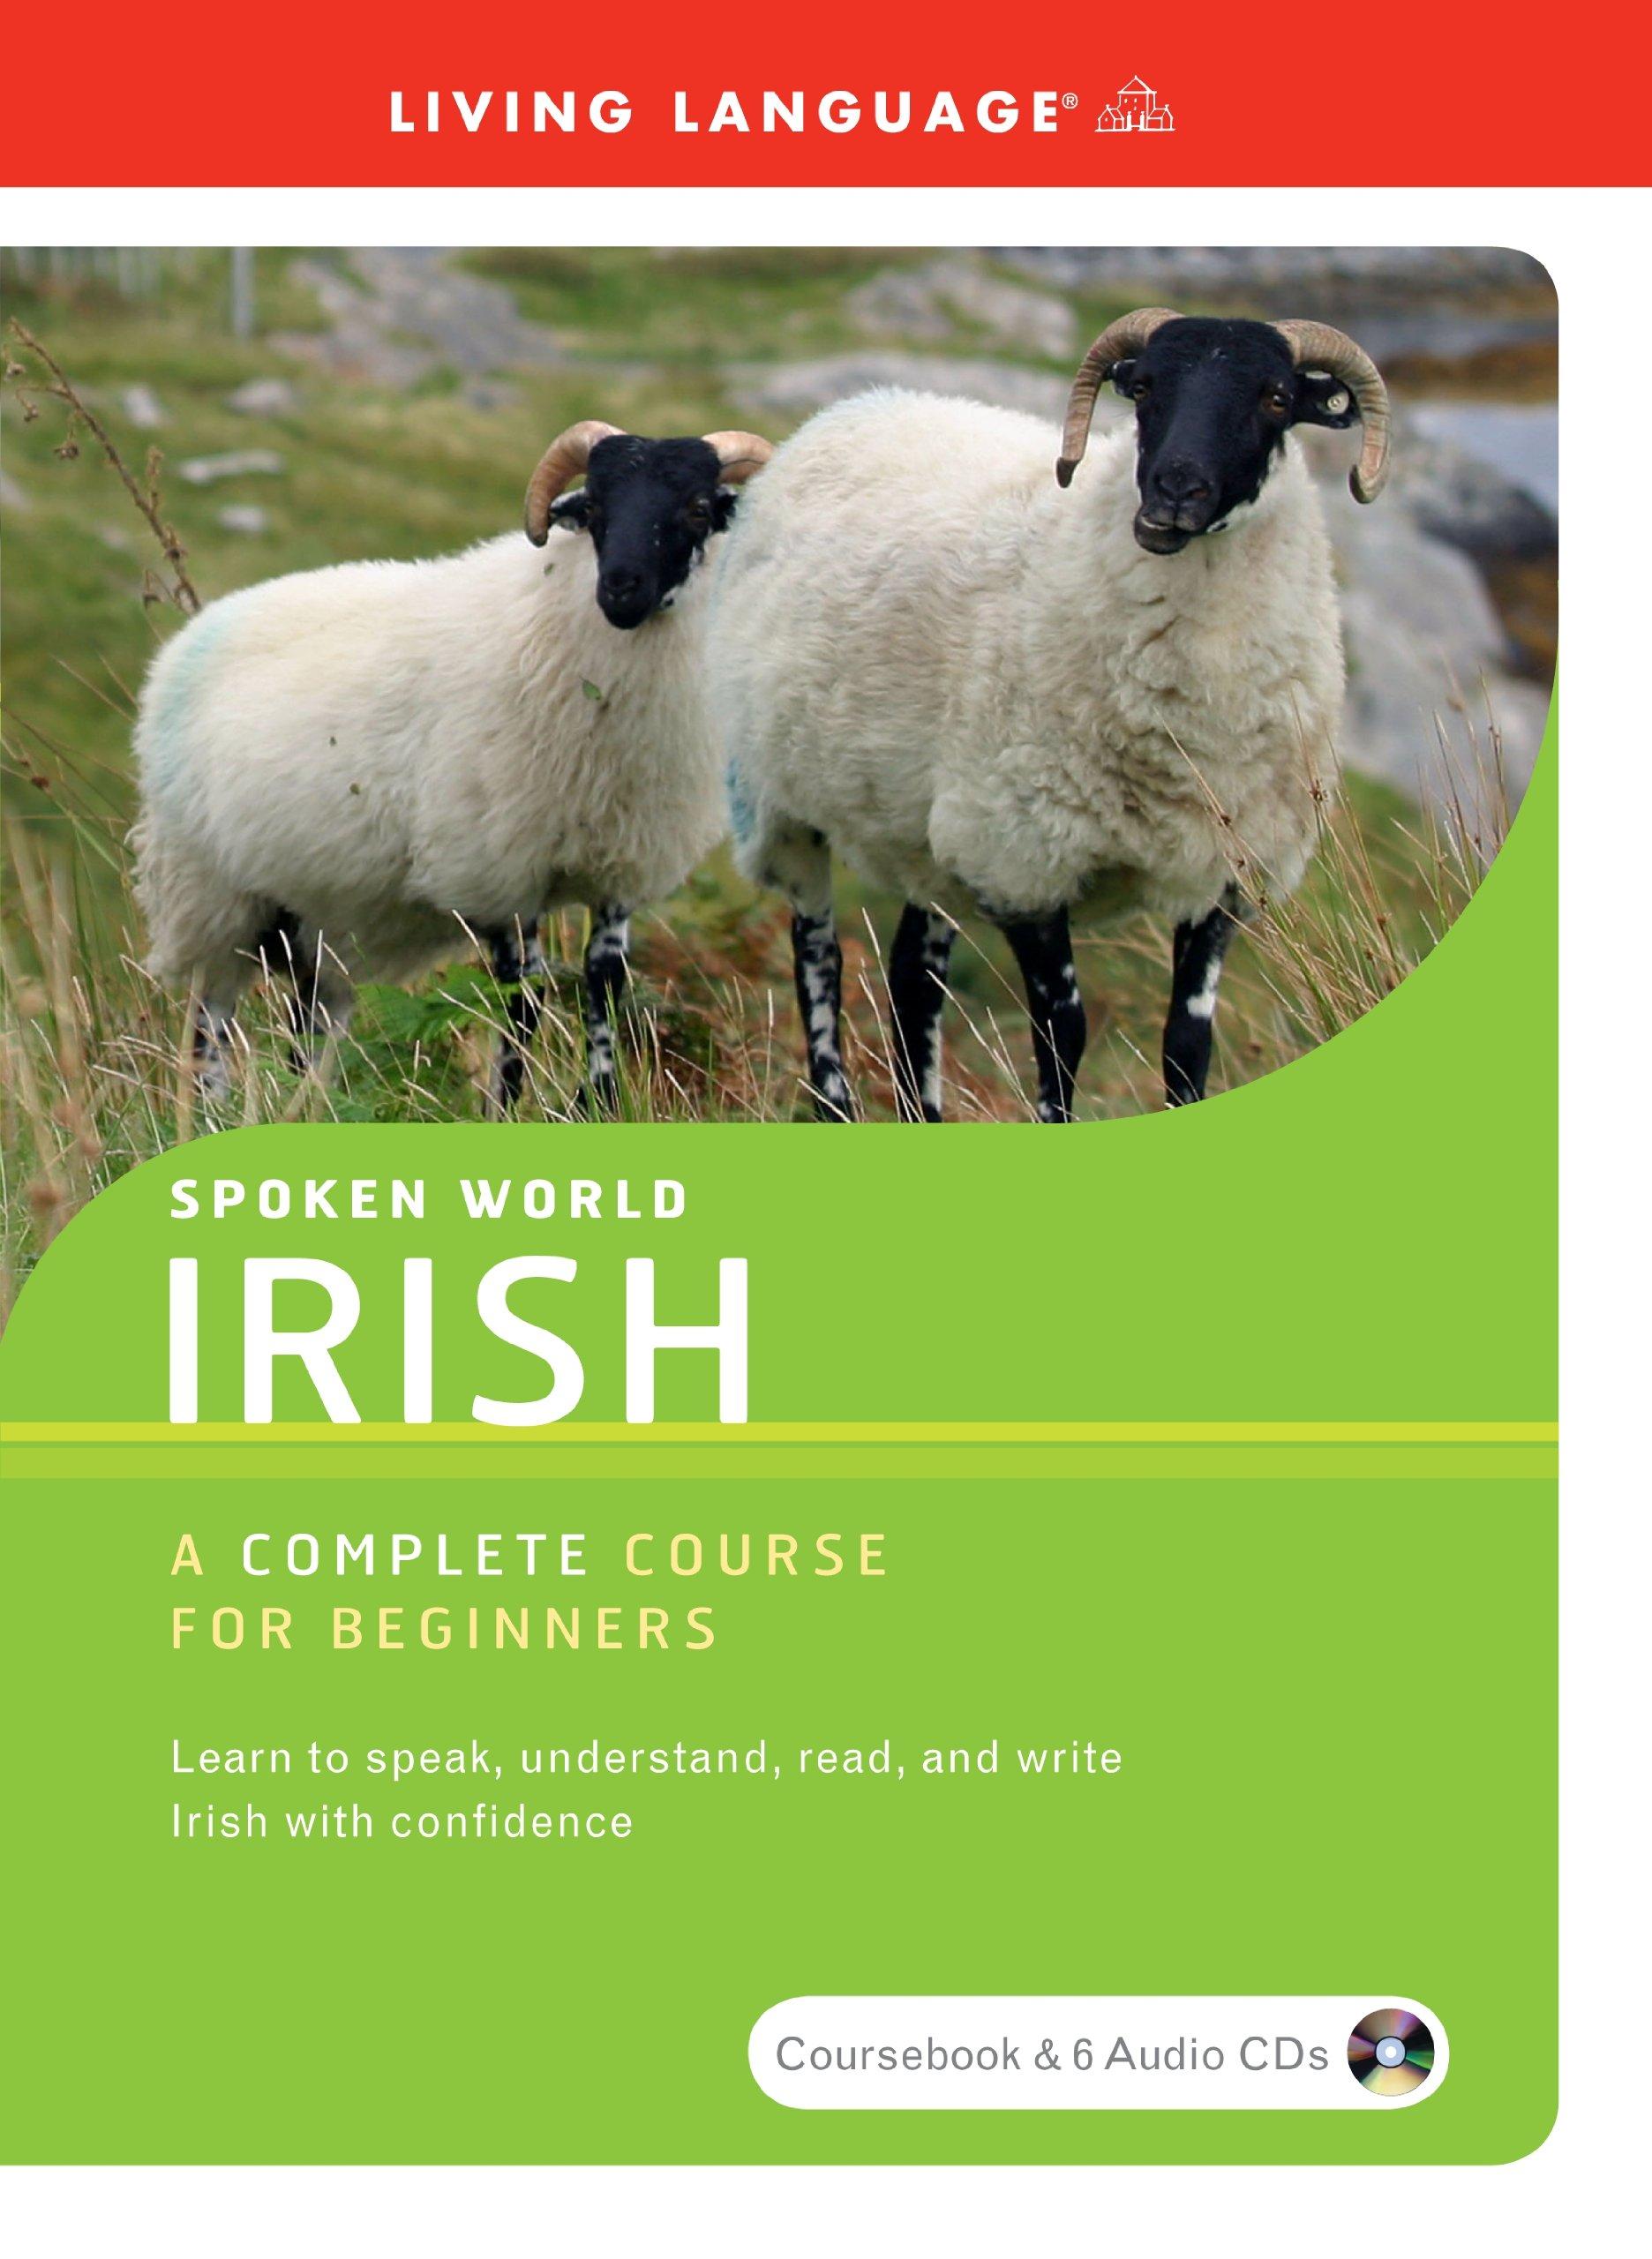 Spoken World: Irish